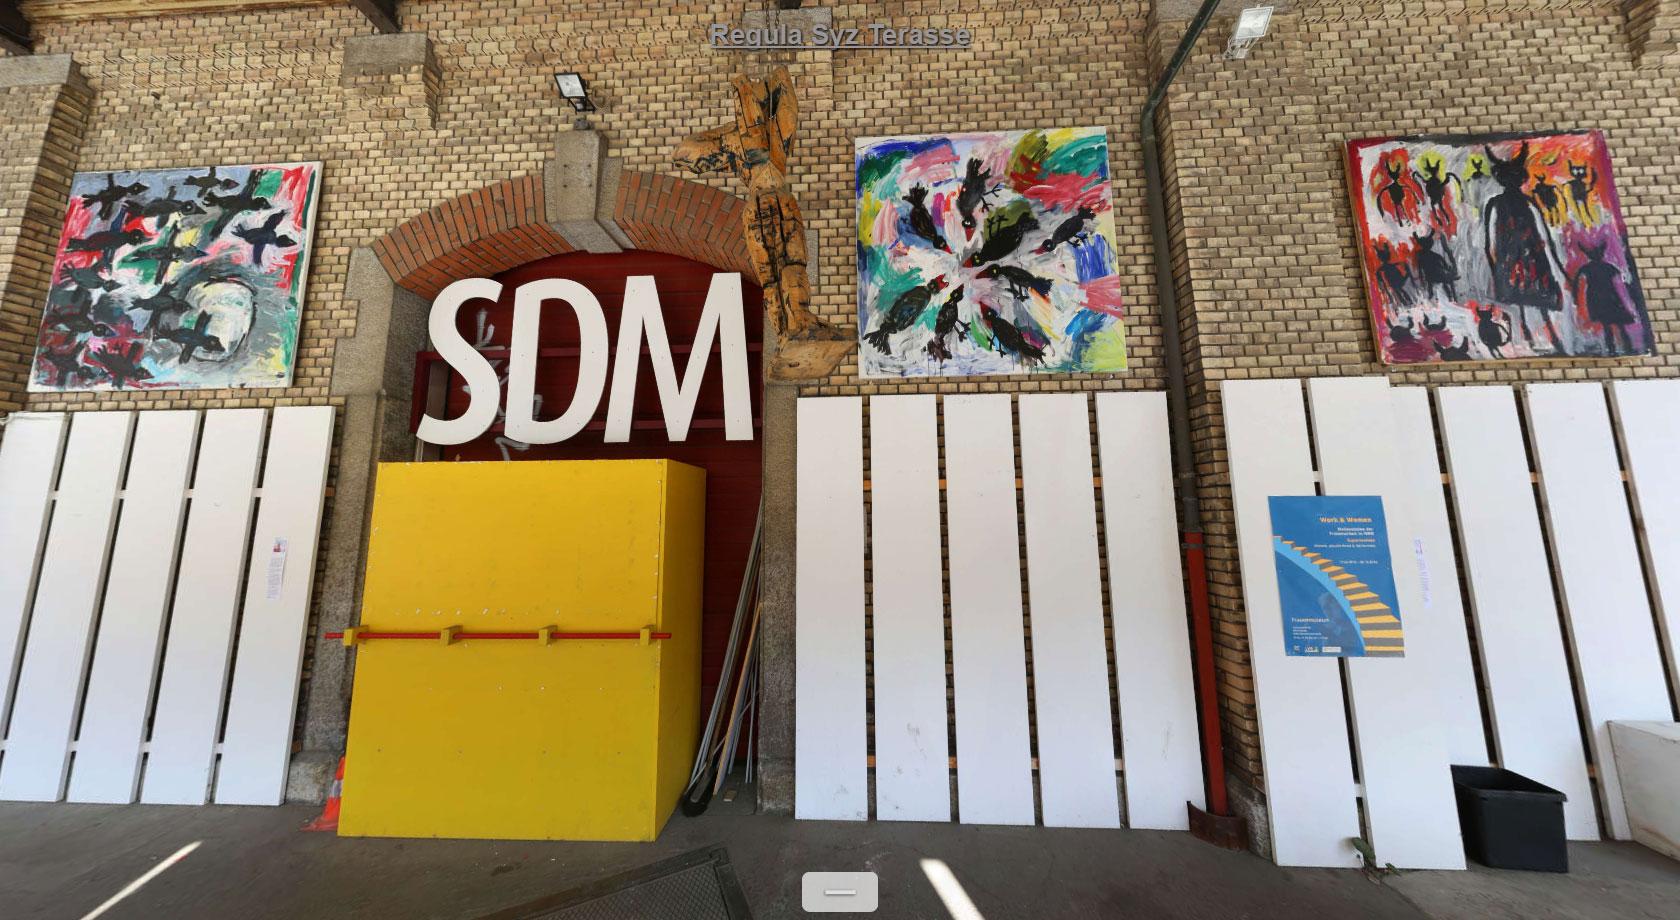 Art Dock Terrasse – Regula Syz